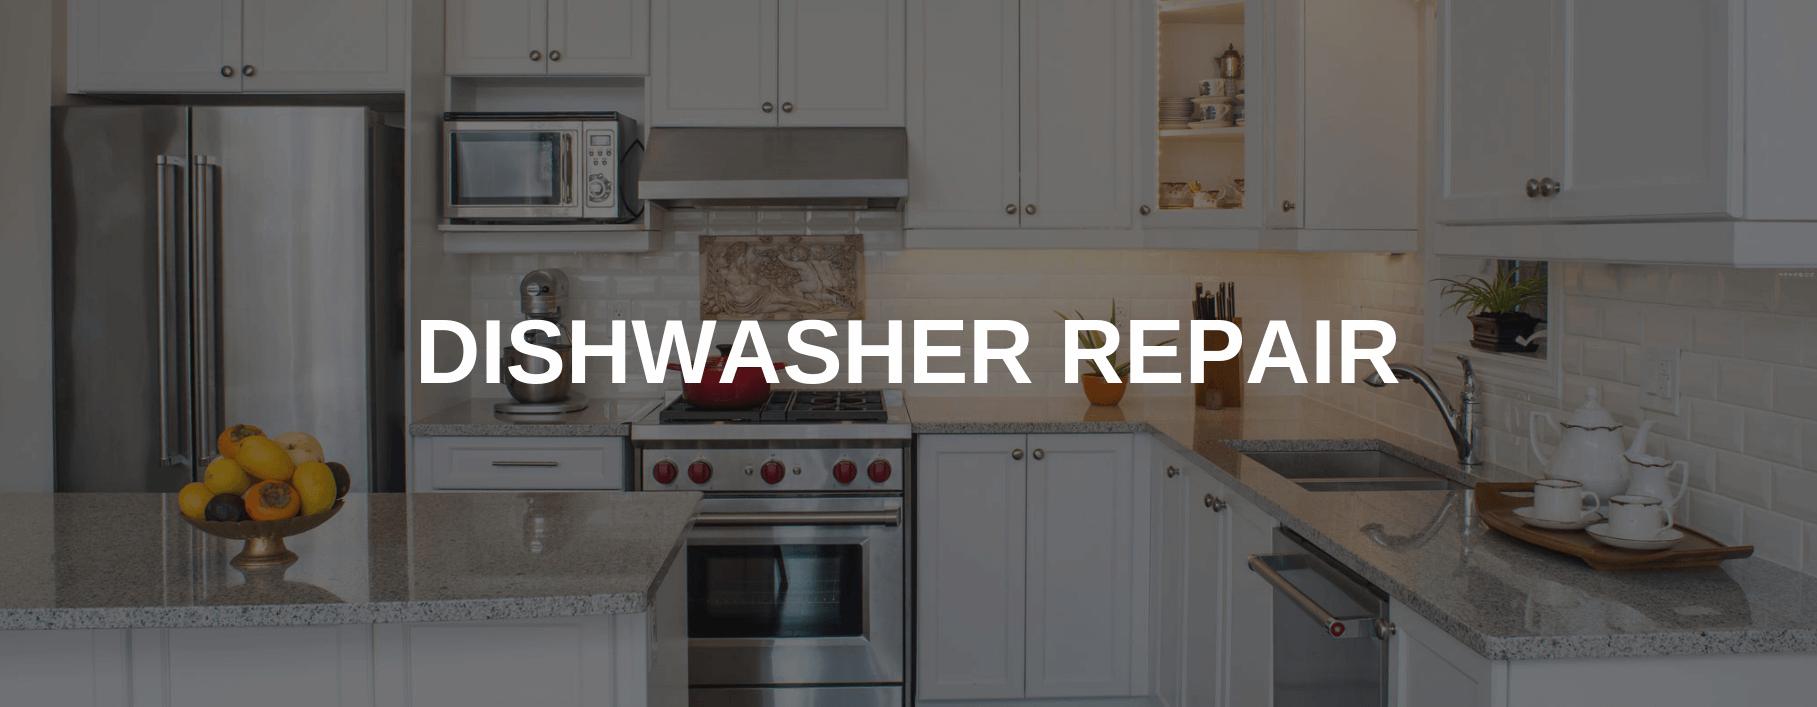 dishwasher repair alexandria